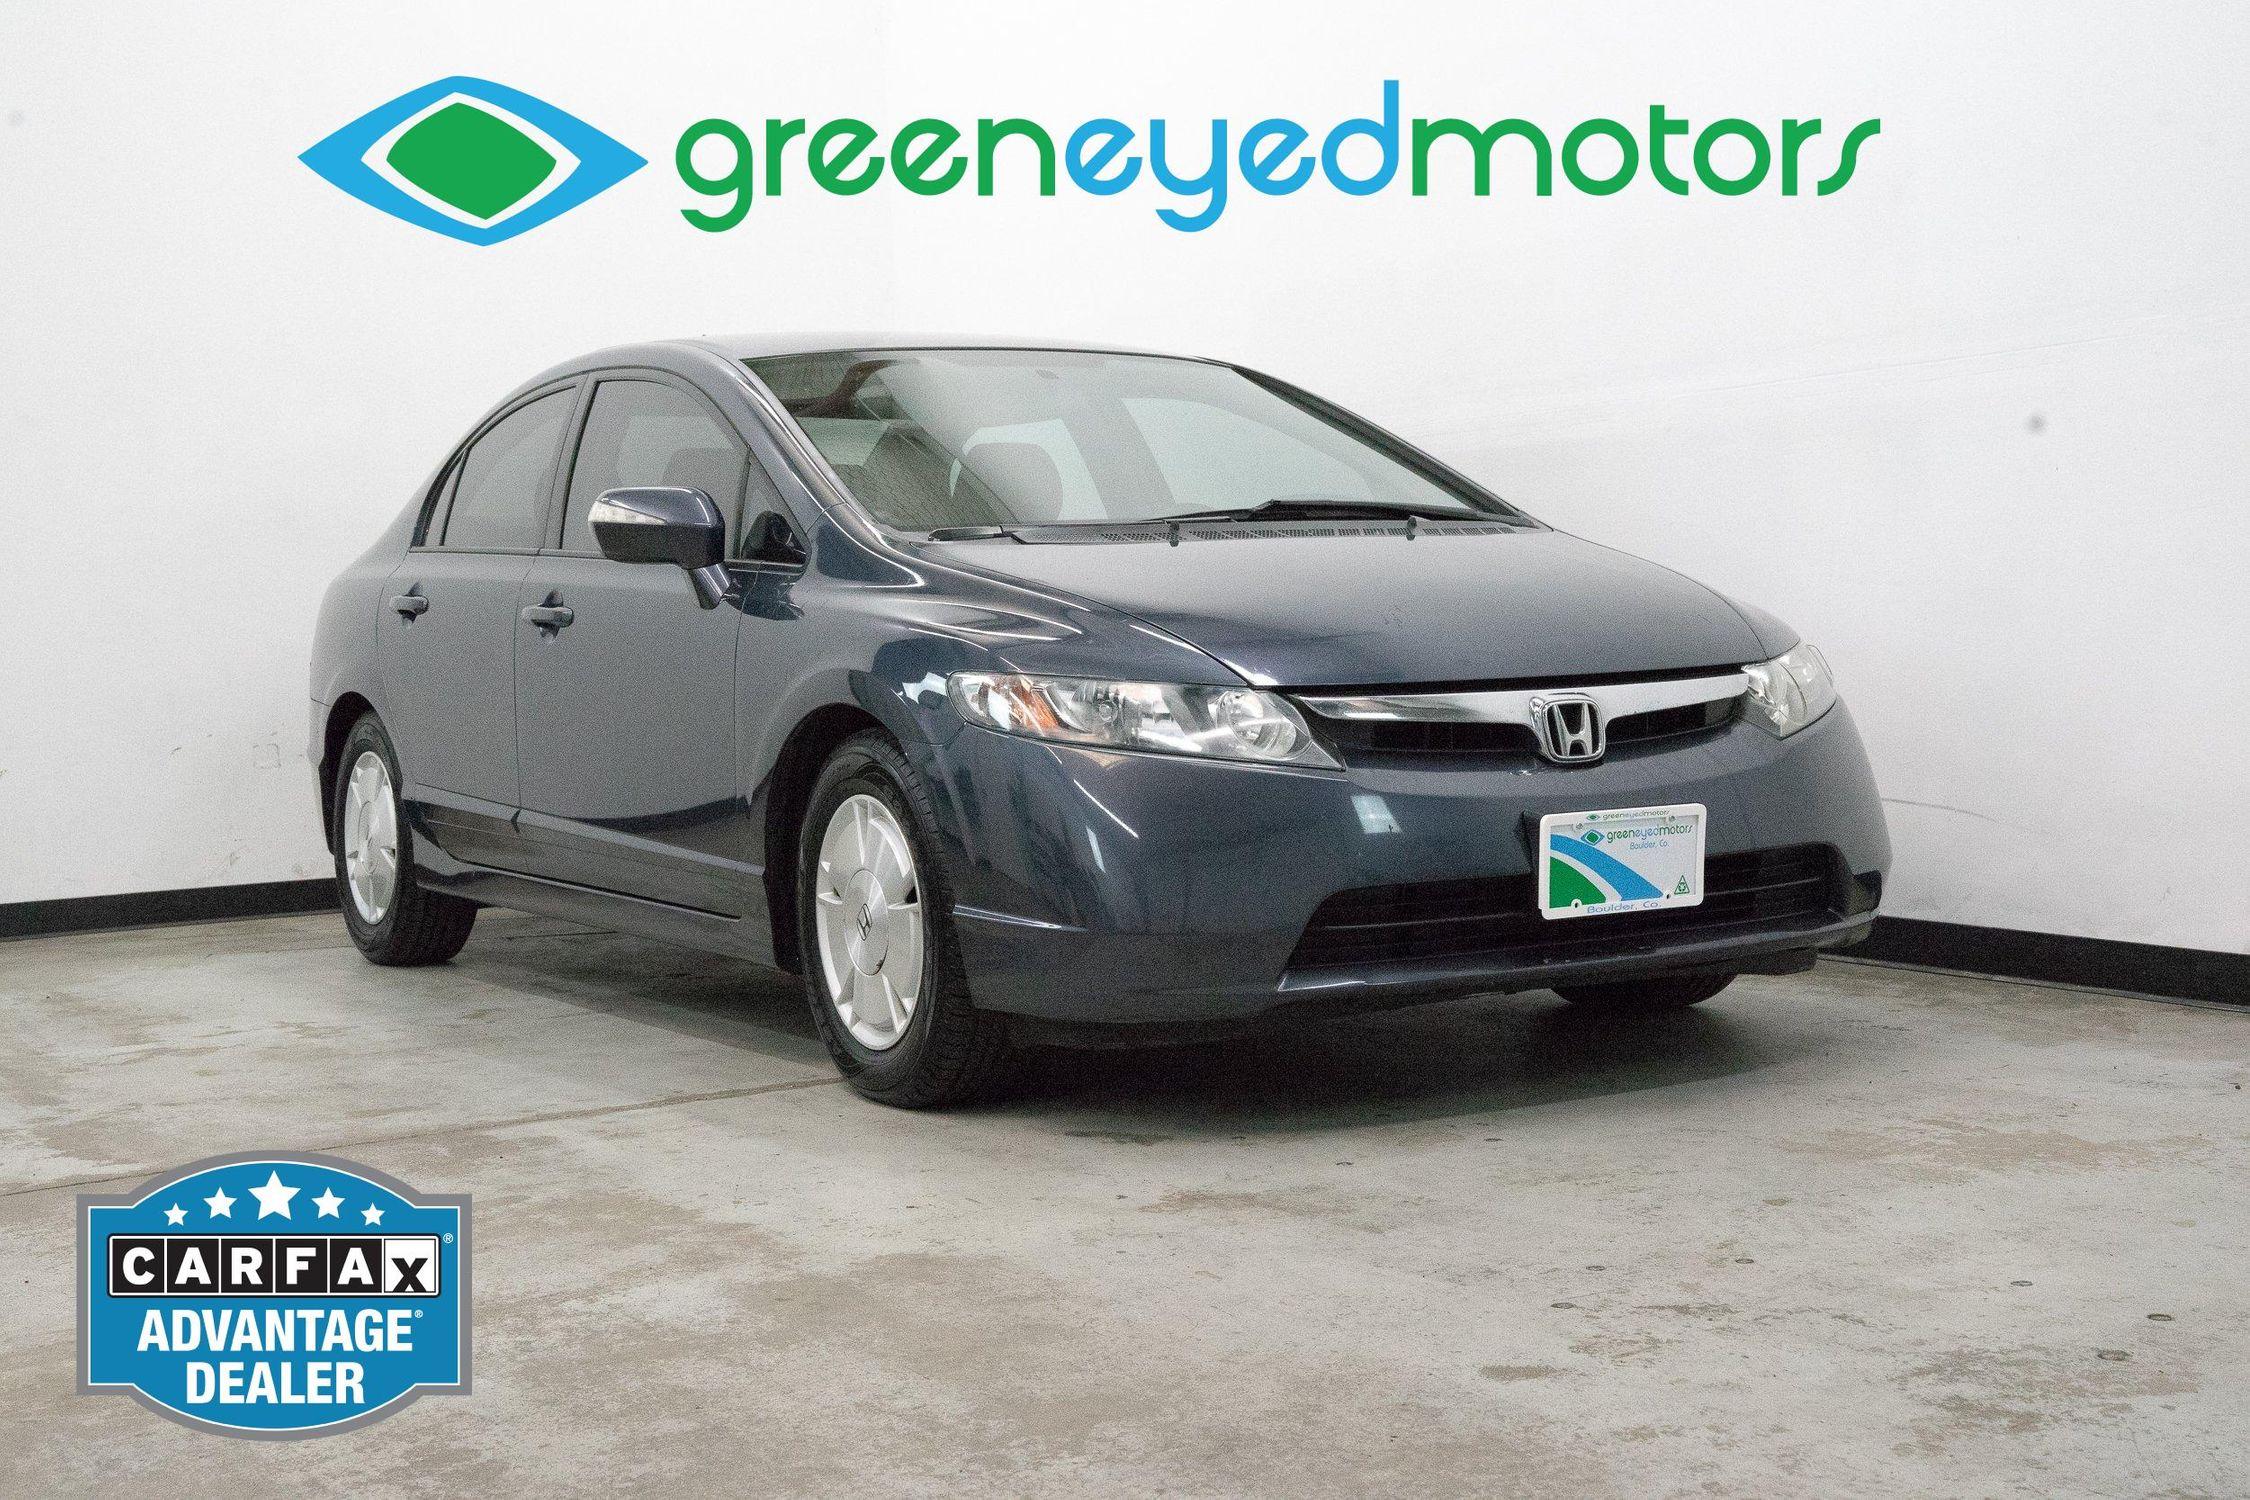 2007 Honda Civic Hybrid | Green Eyed Motors